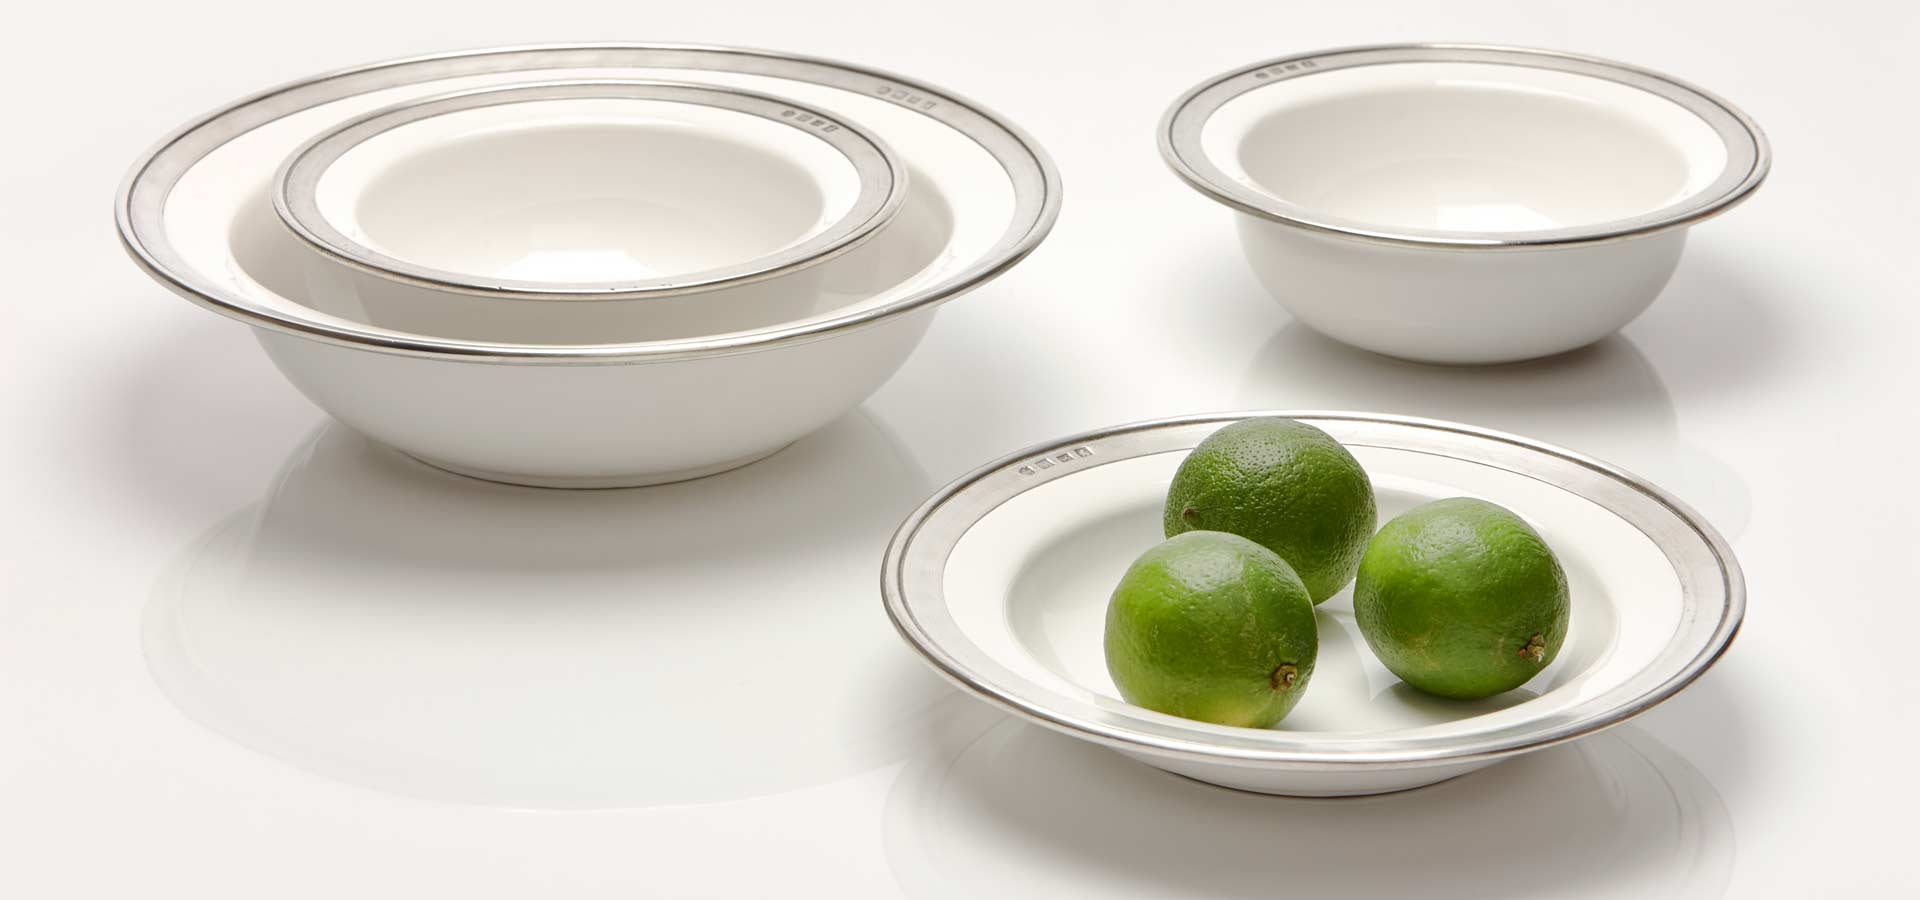 bowls, fruit stands